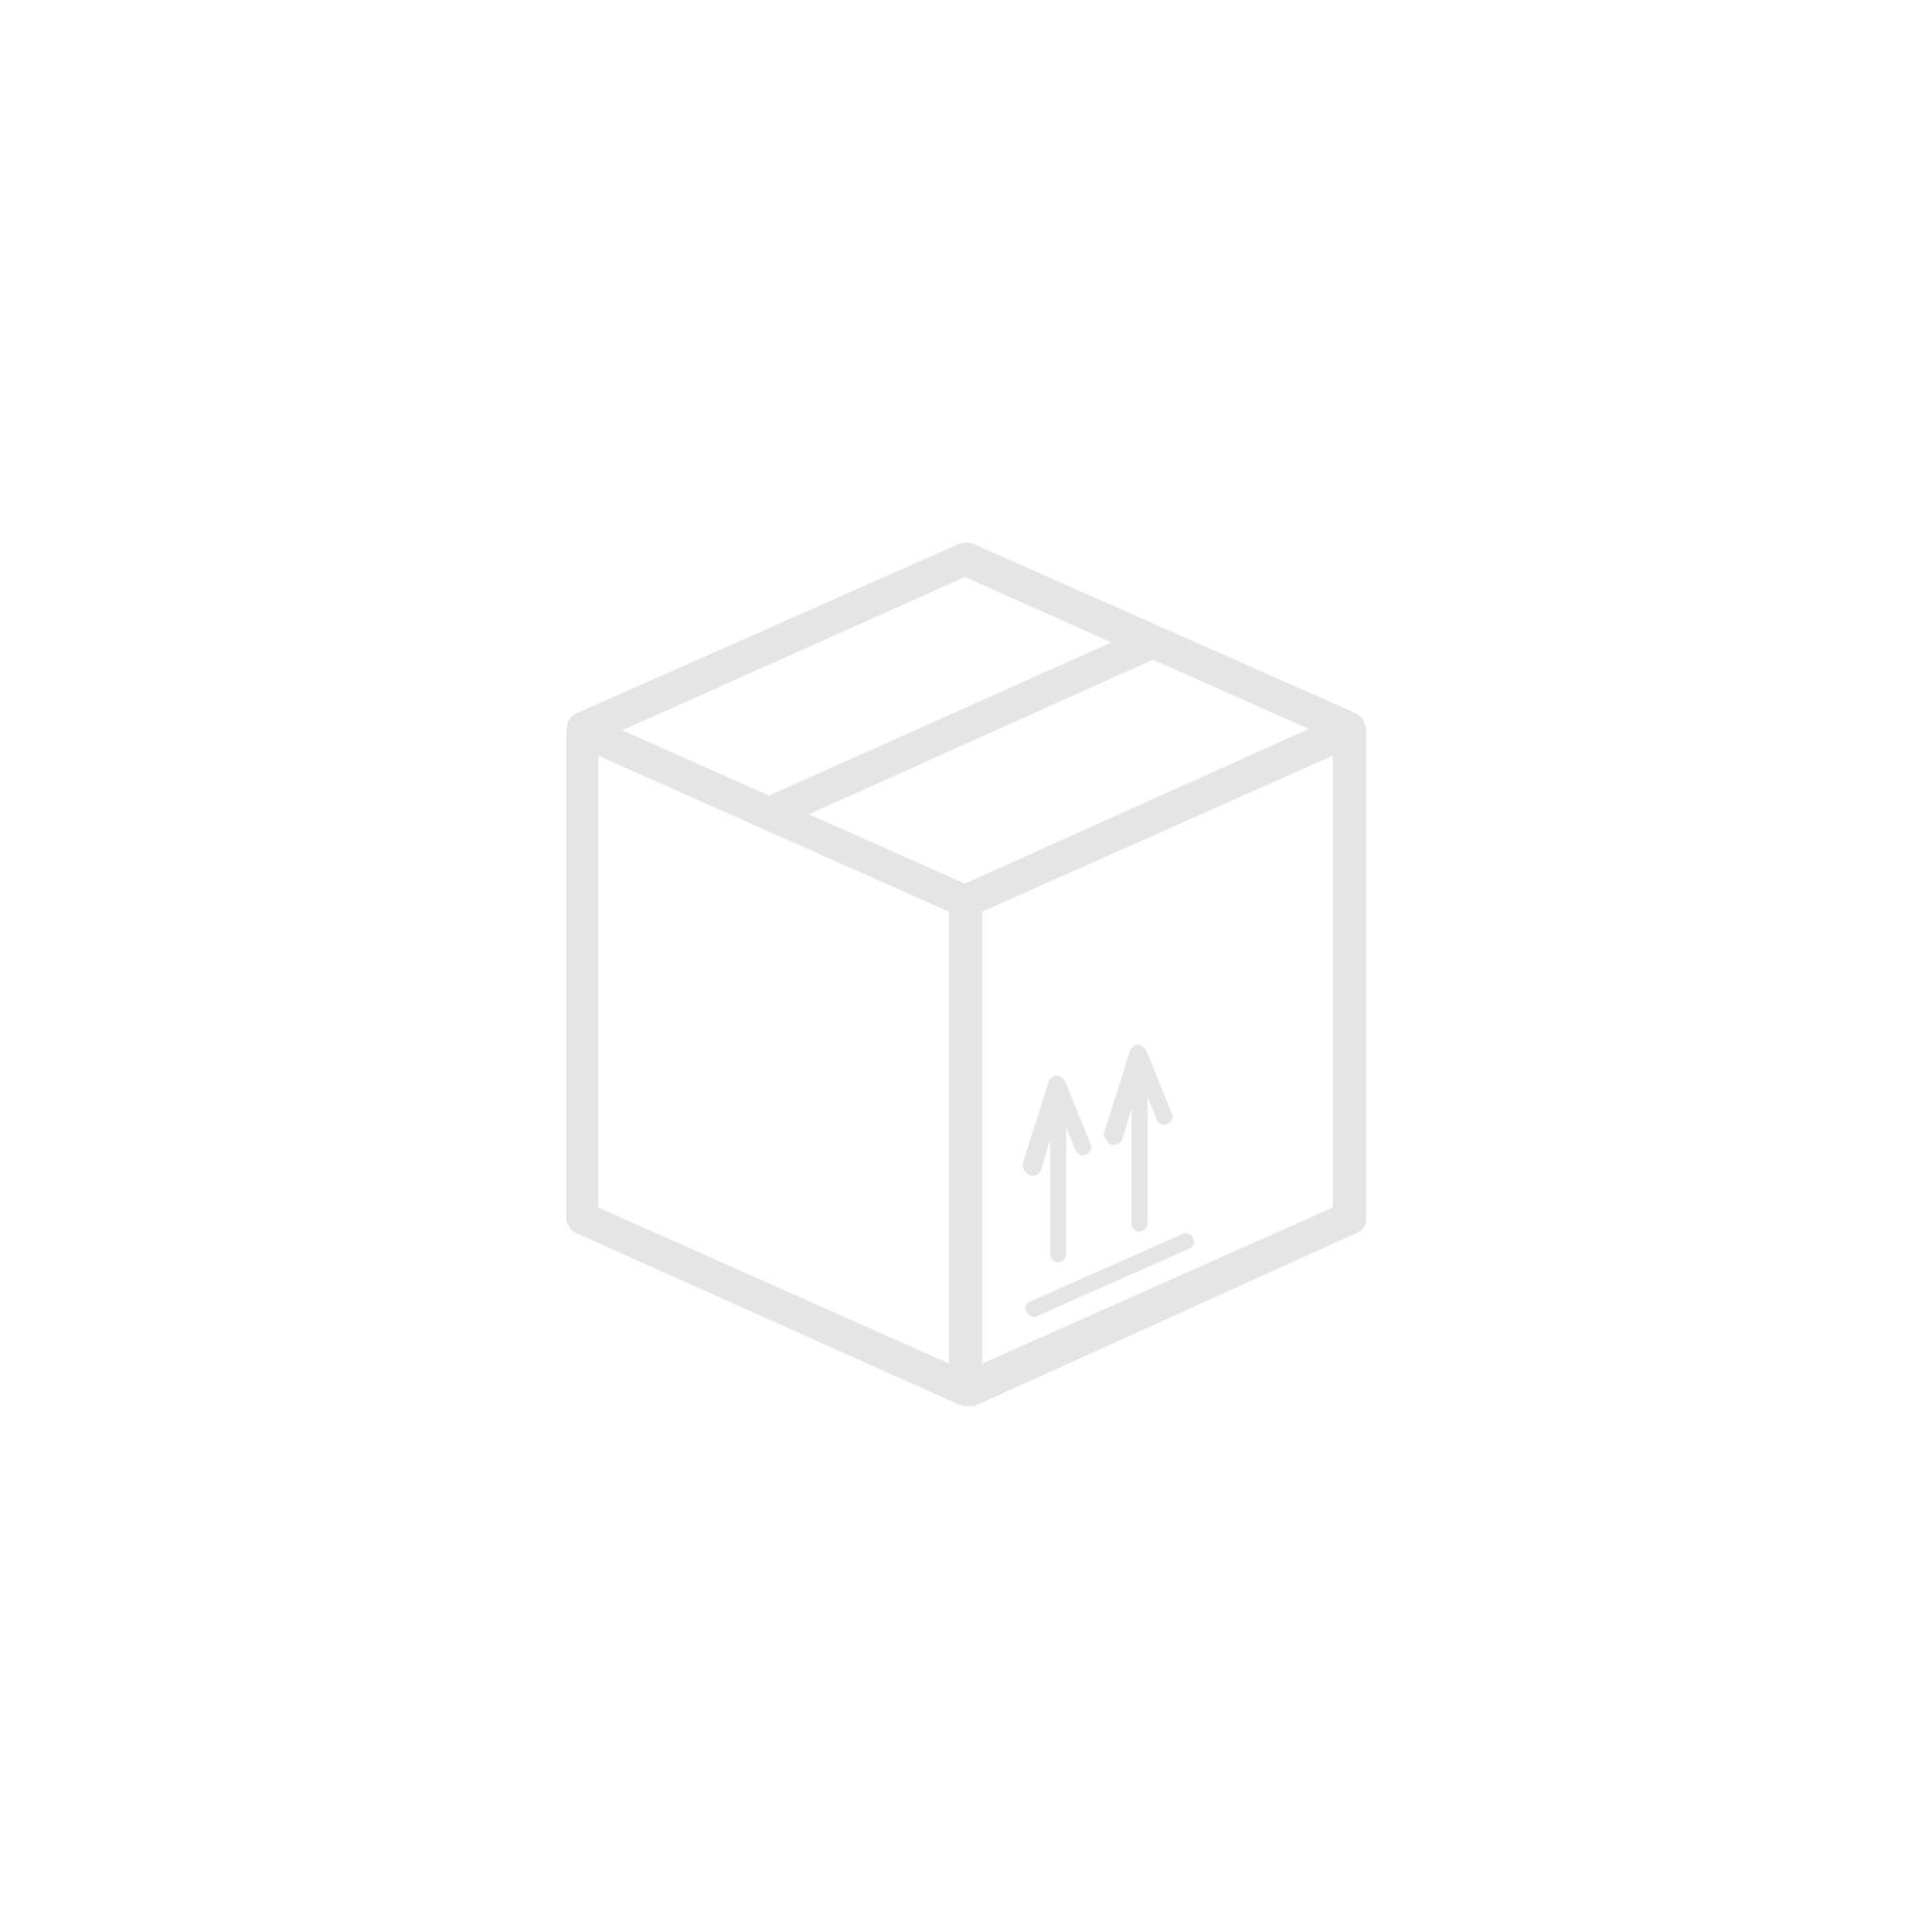 MERKUR drátěný kabelový žlab, 100x50 mm, délka 2 m, M2 galvanický zinek